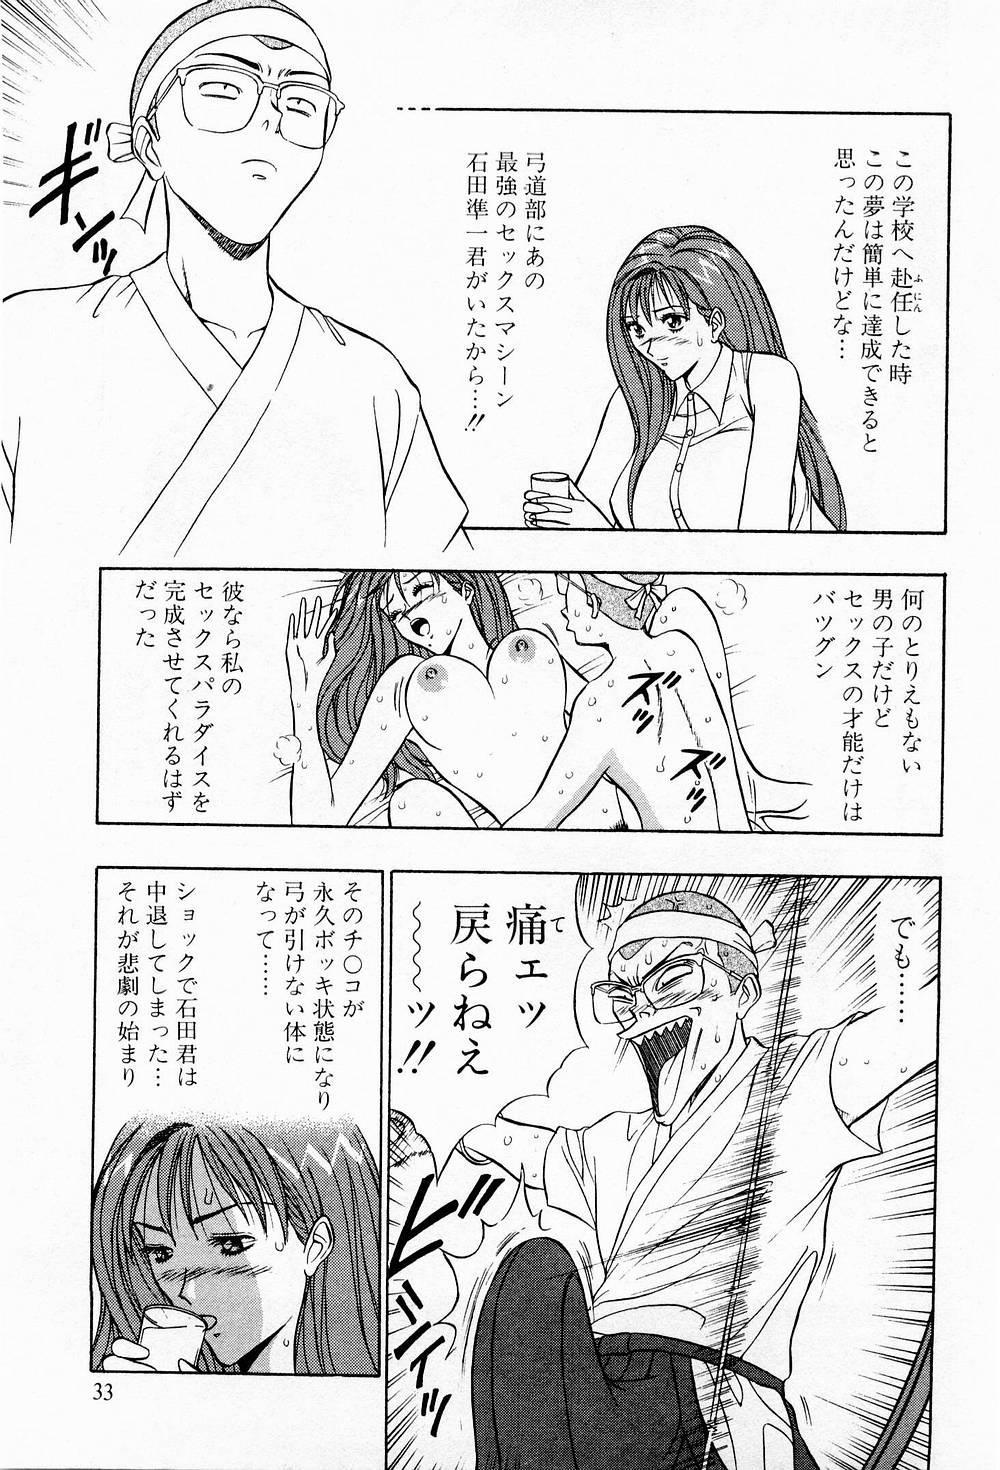 Bakusha Kyuudou Men 3 32